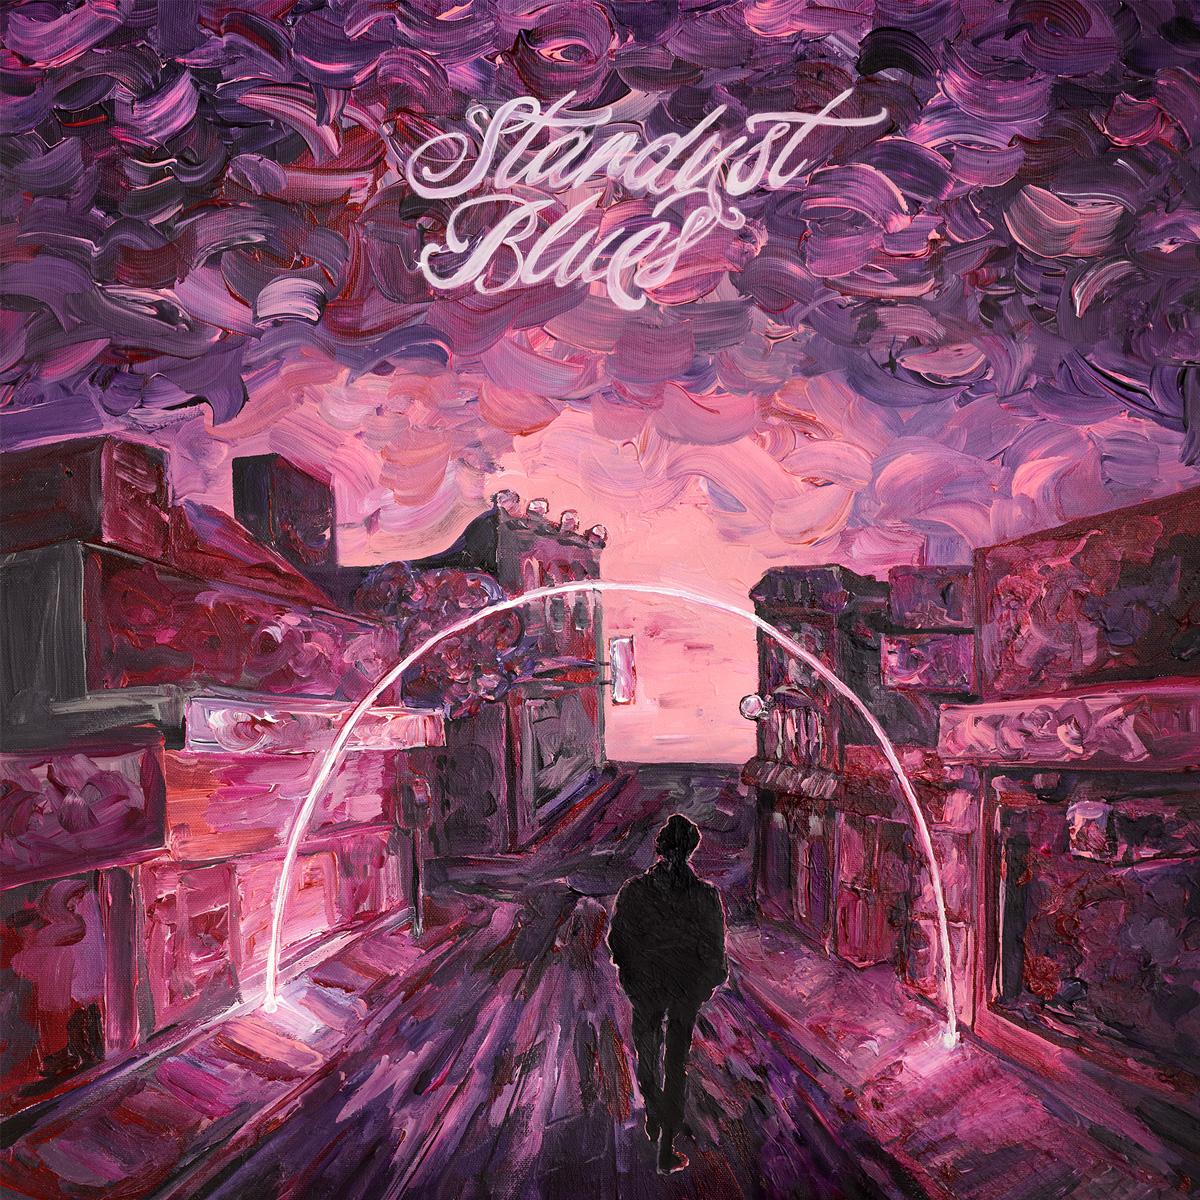 Husky Gawenda new album 2020 Stardust Blues